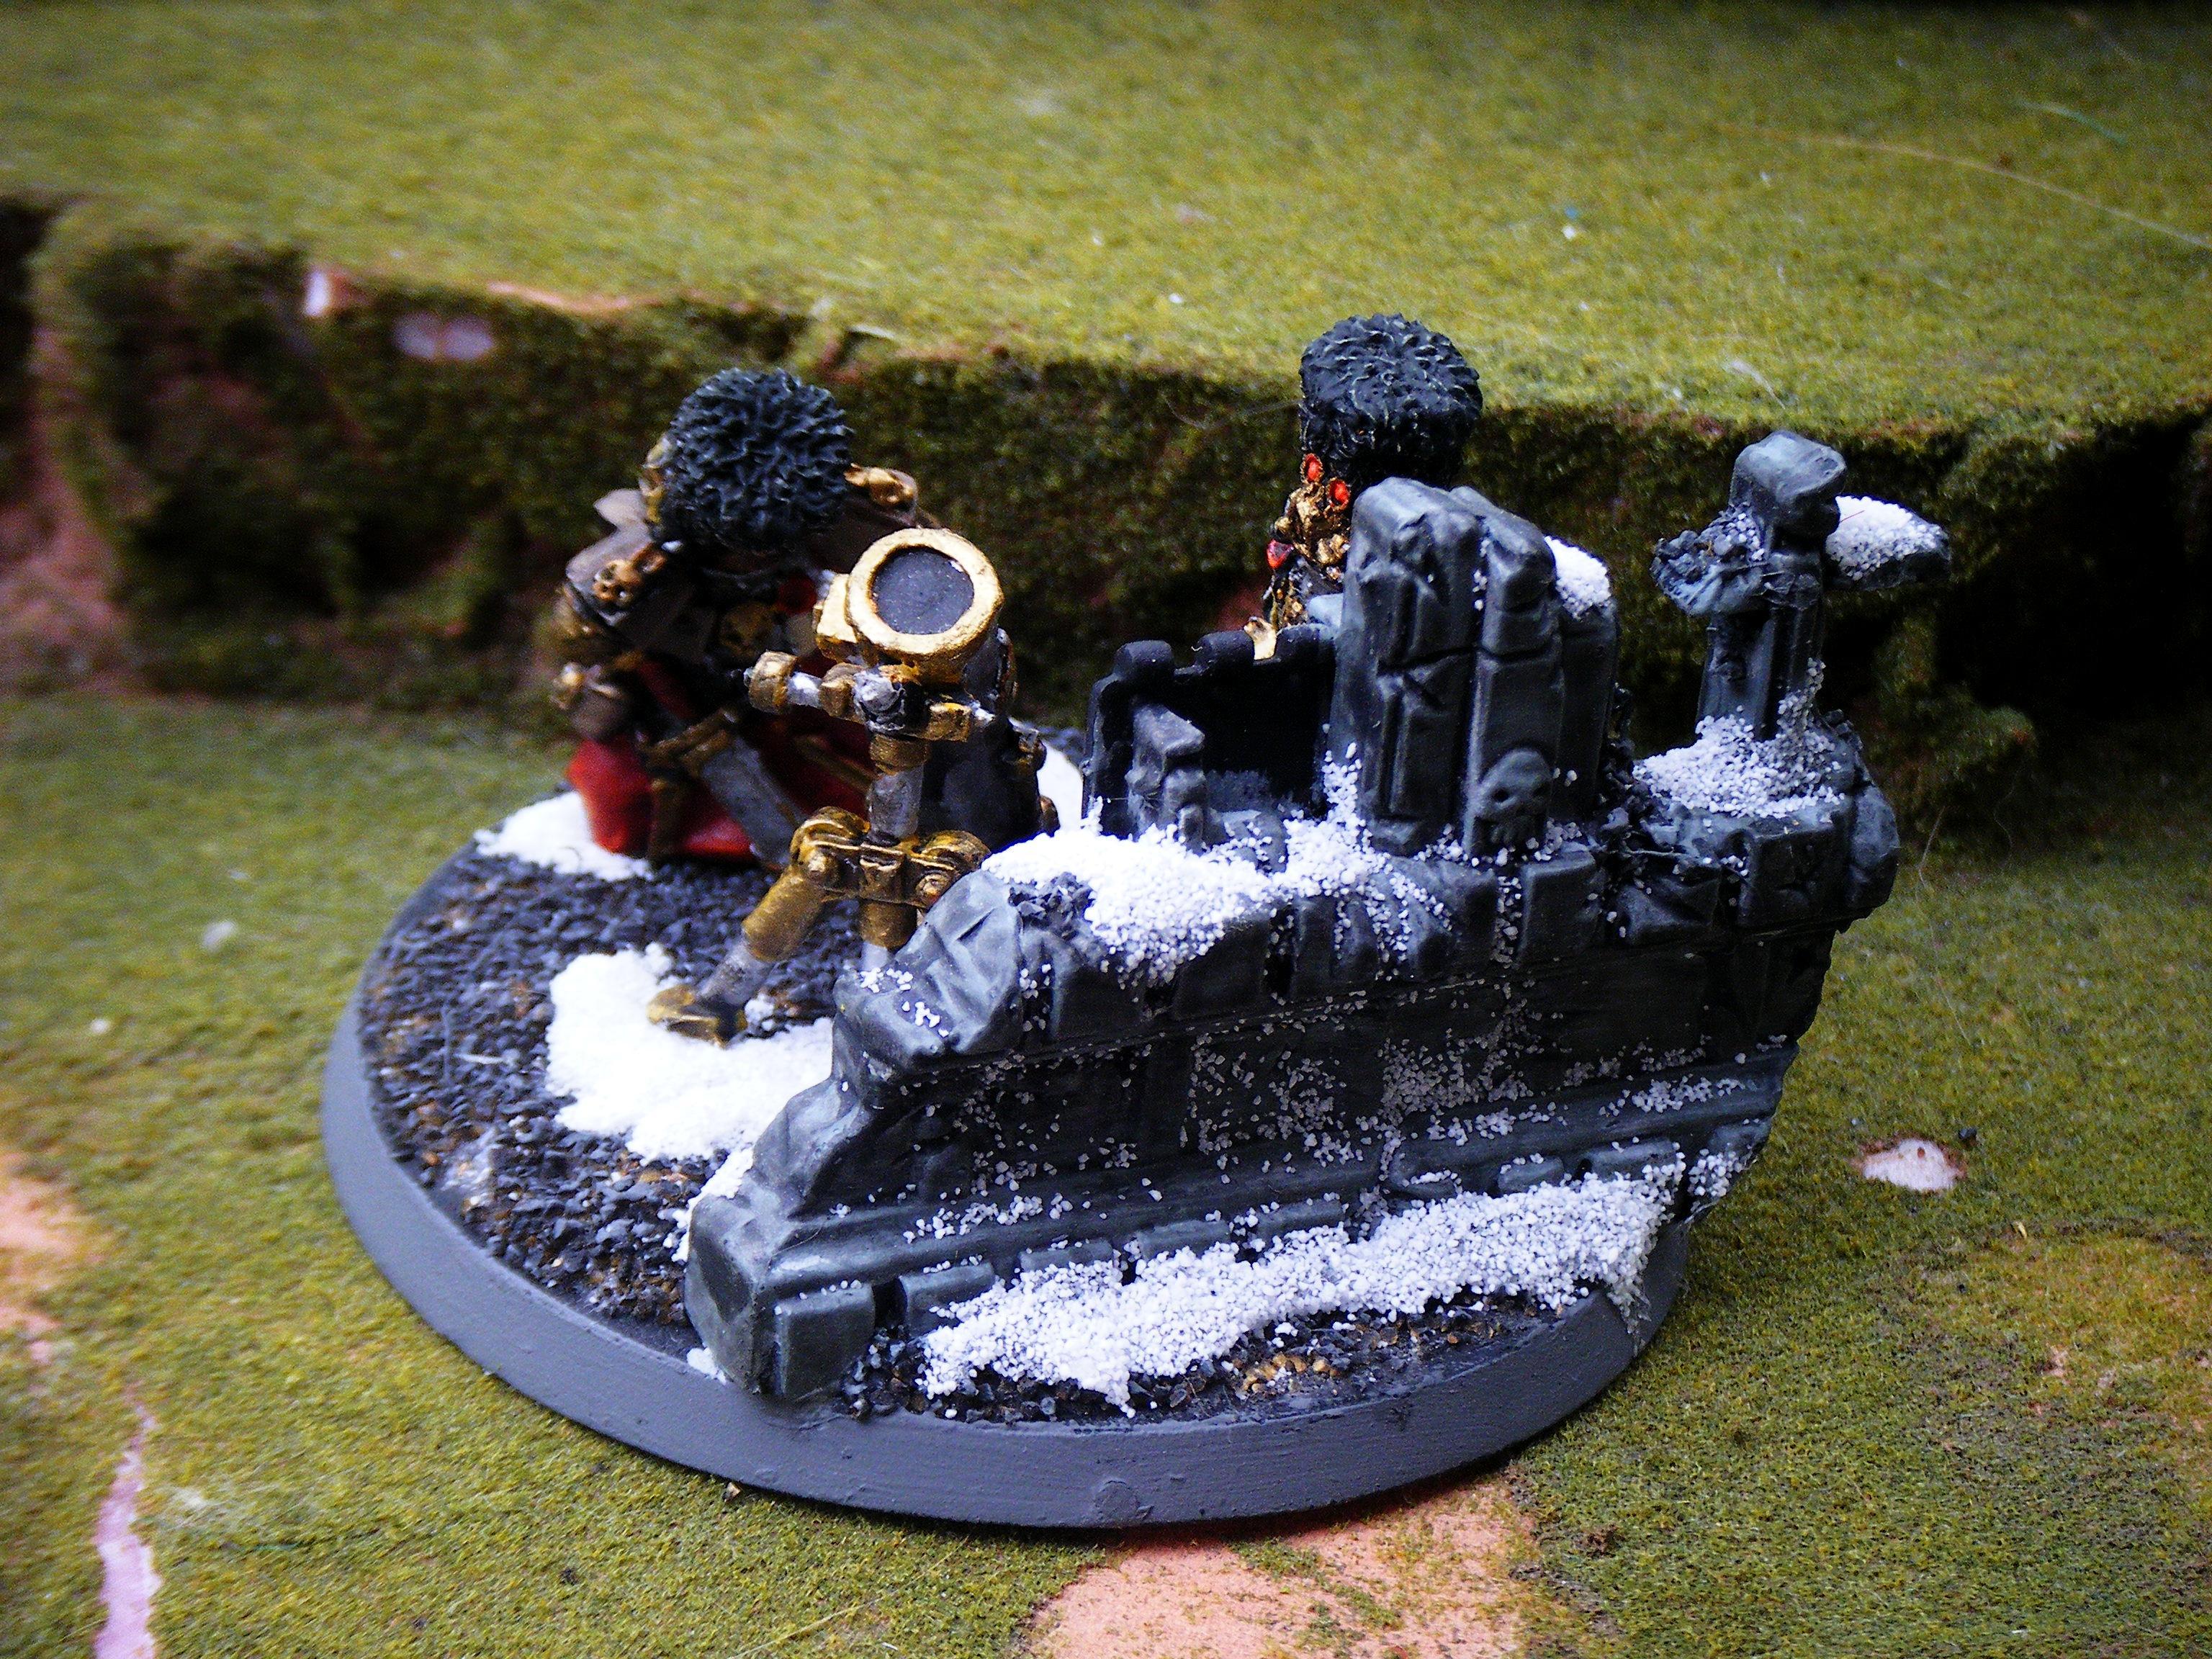 Imperial Guard, mortar team